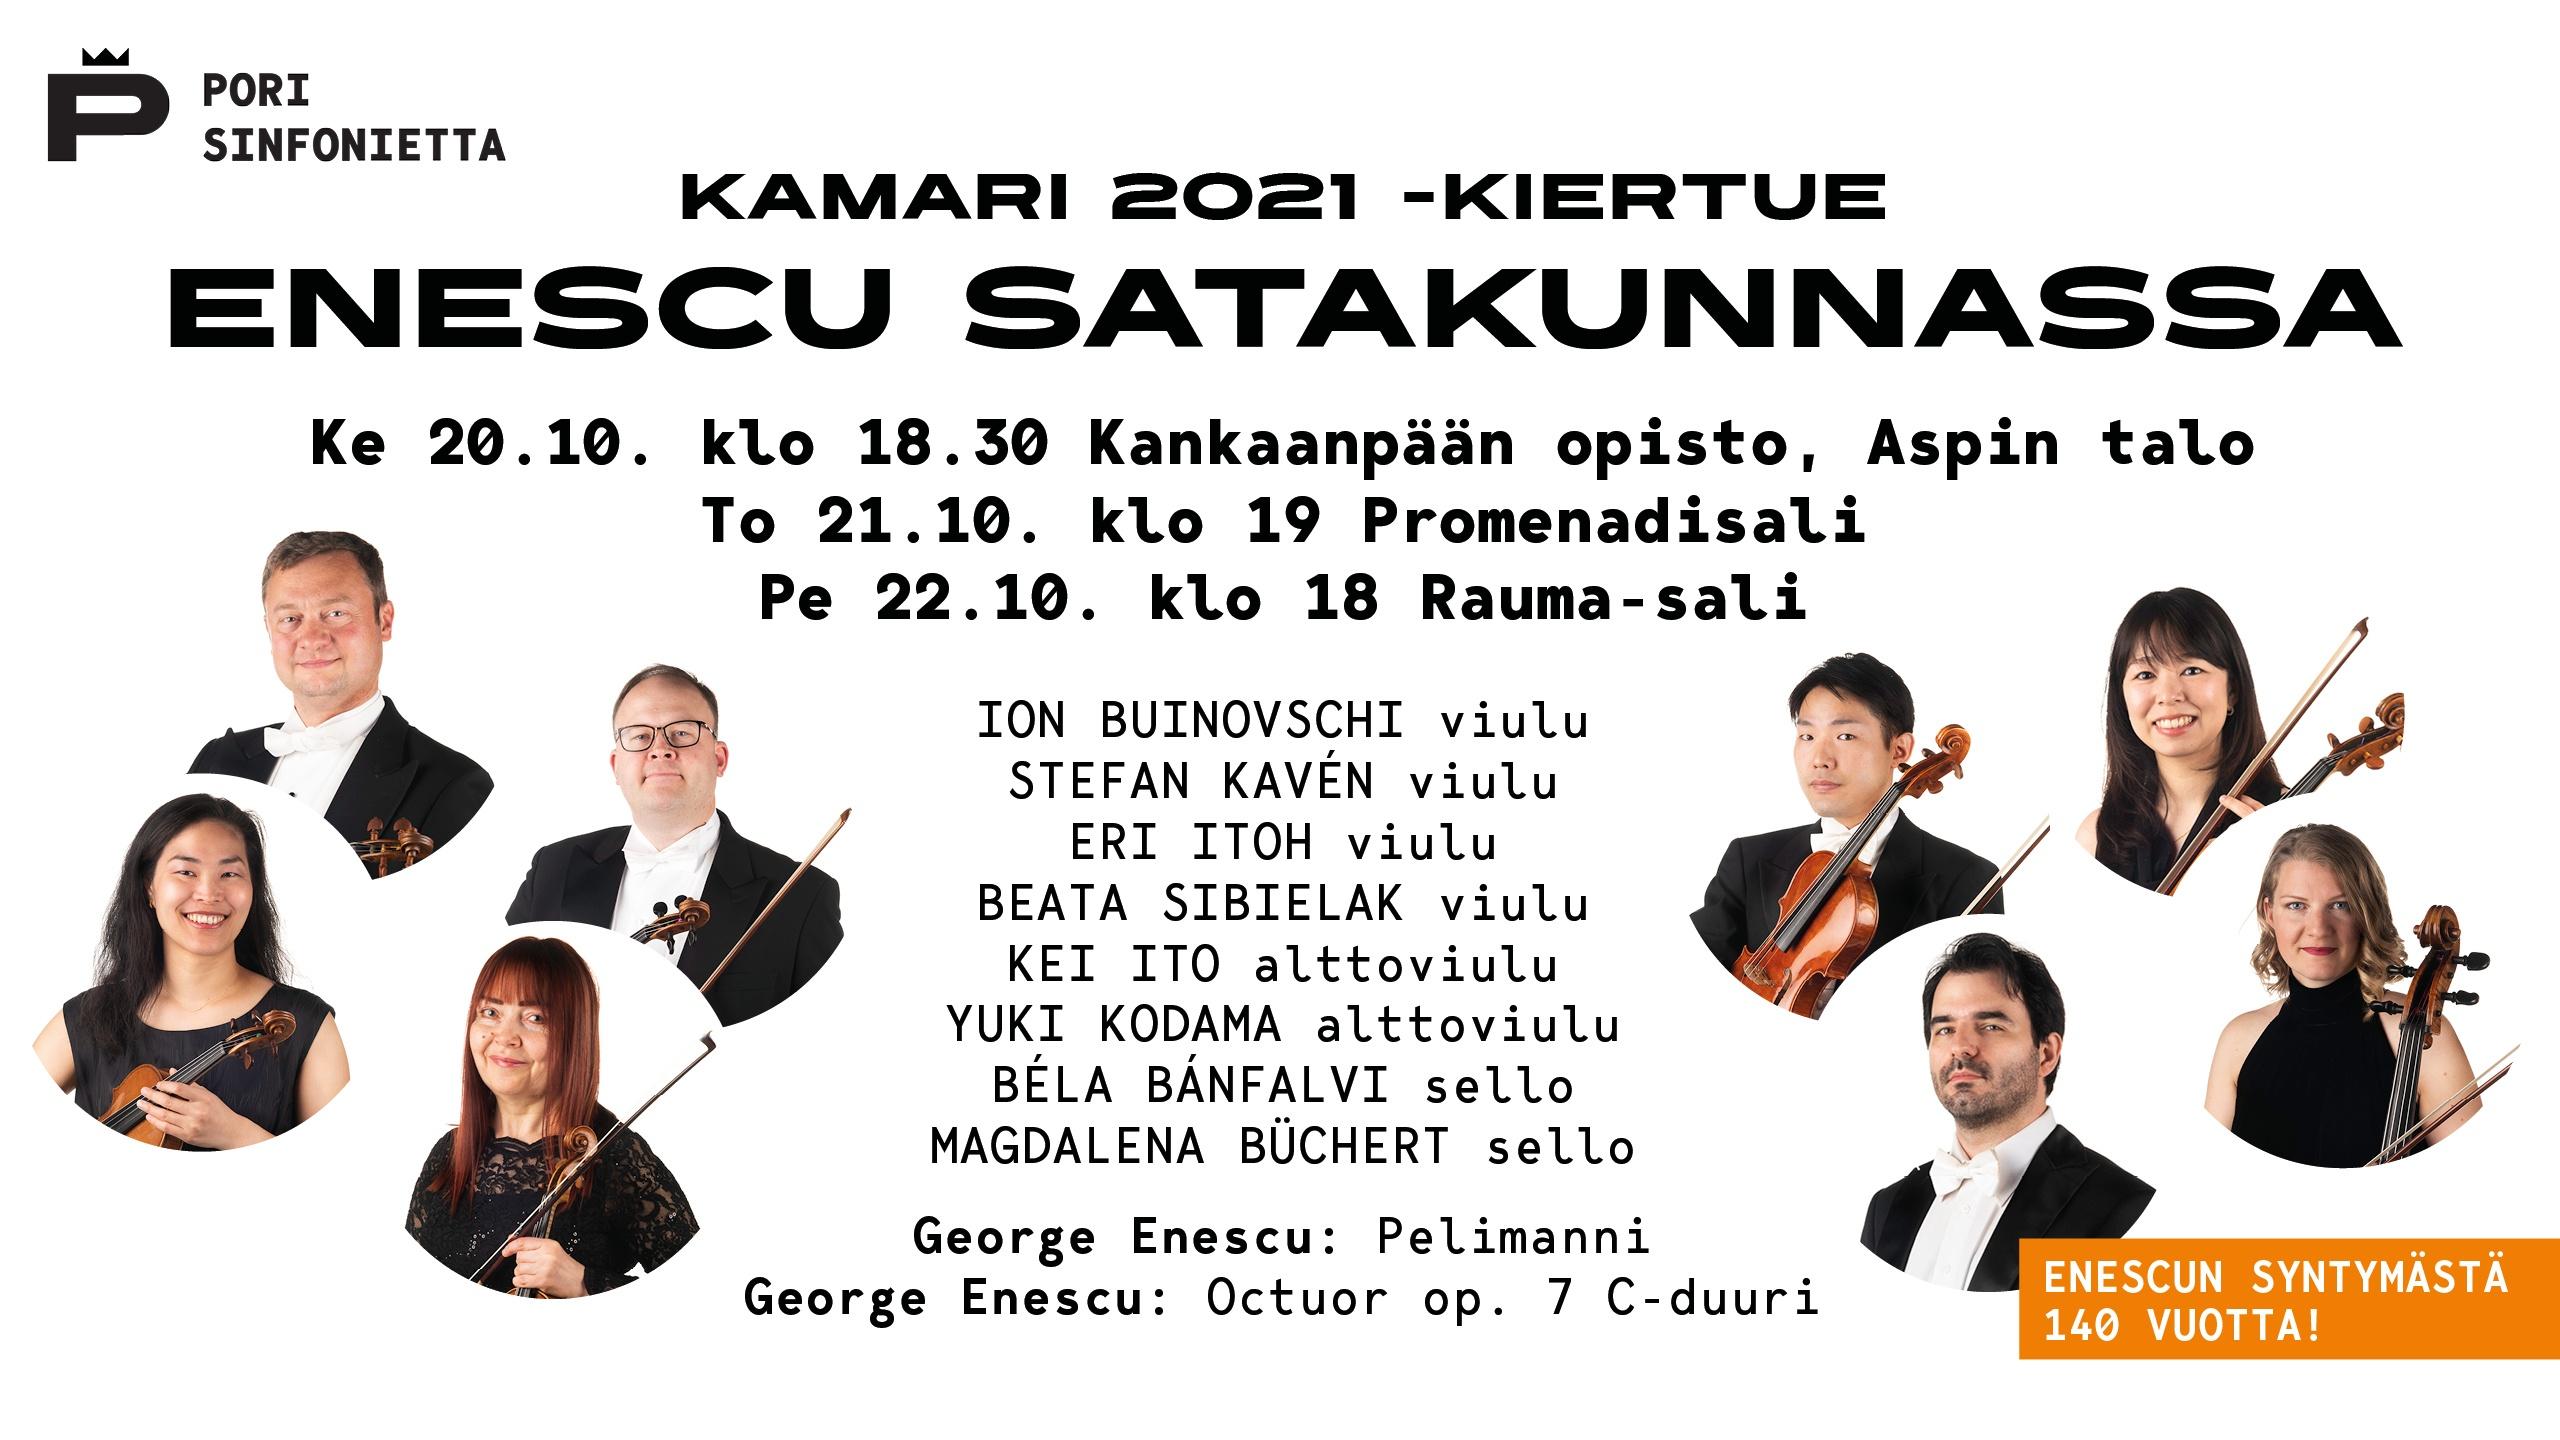 Kamari 2021 -kiertue: Enescu Satakunnassa – Pori